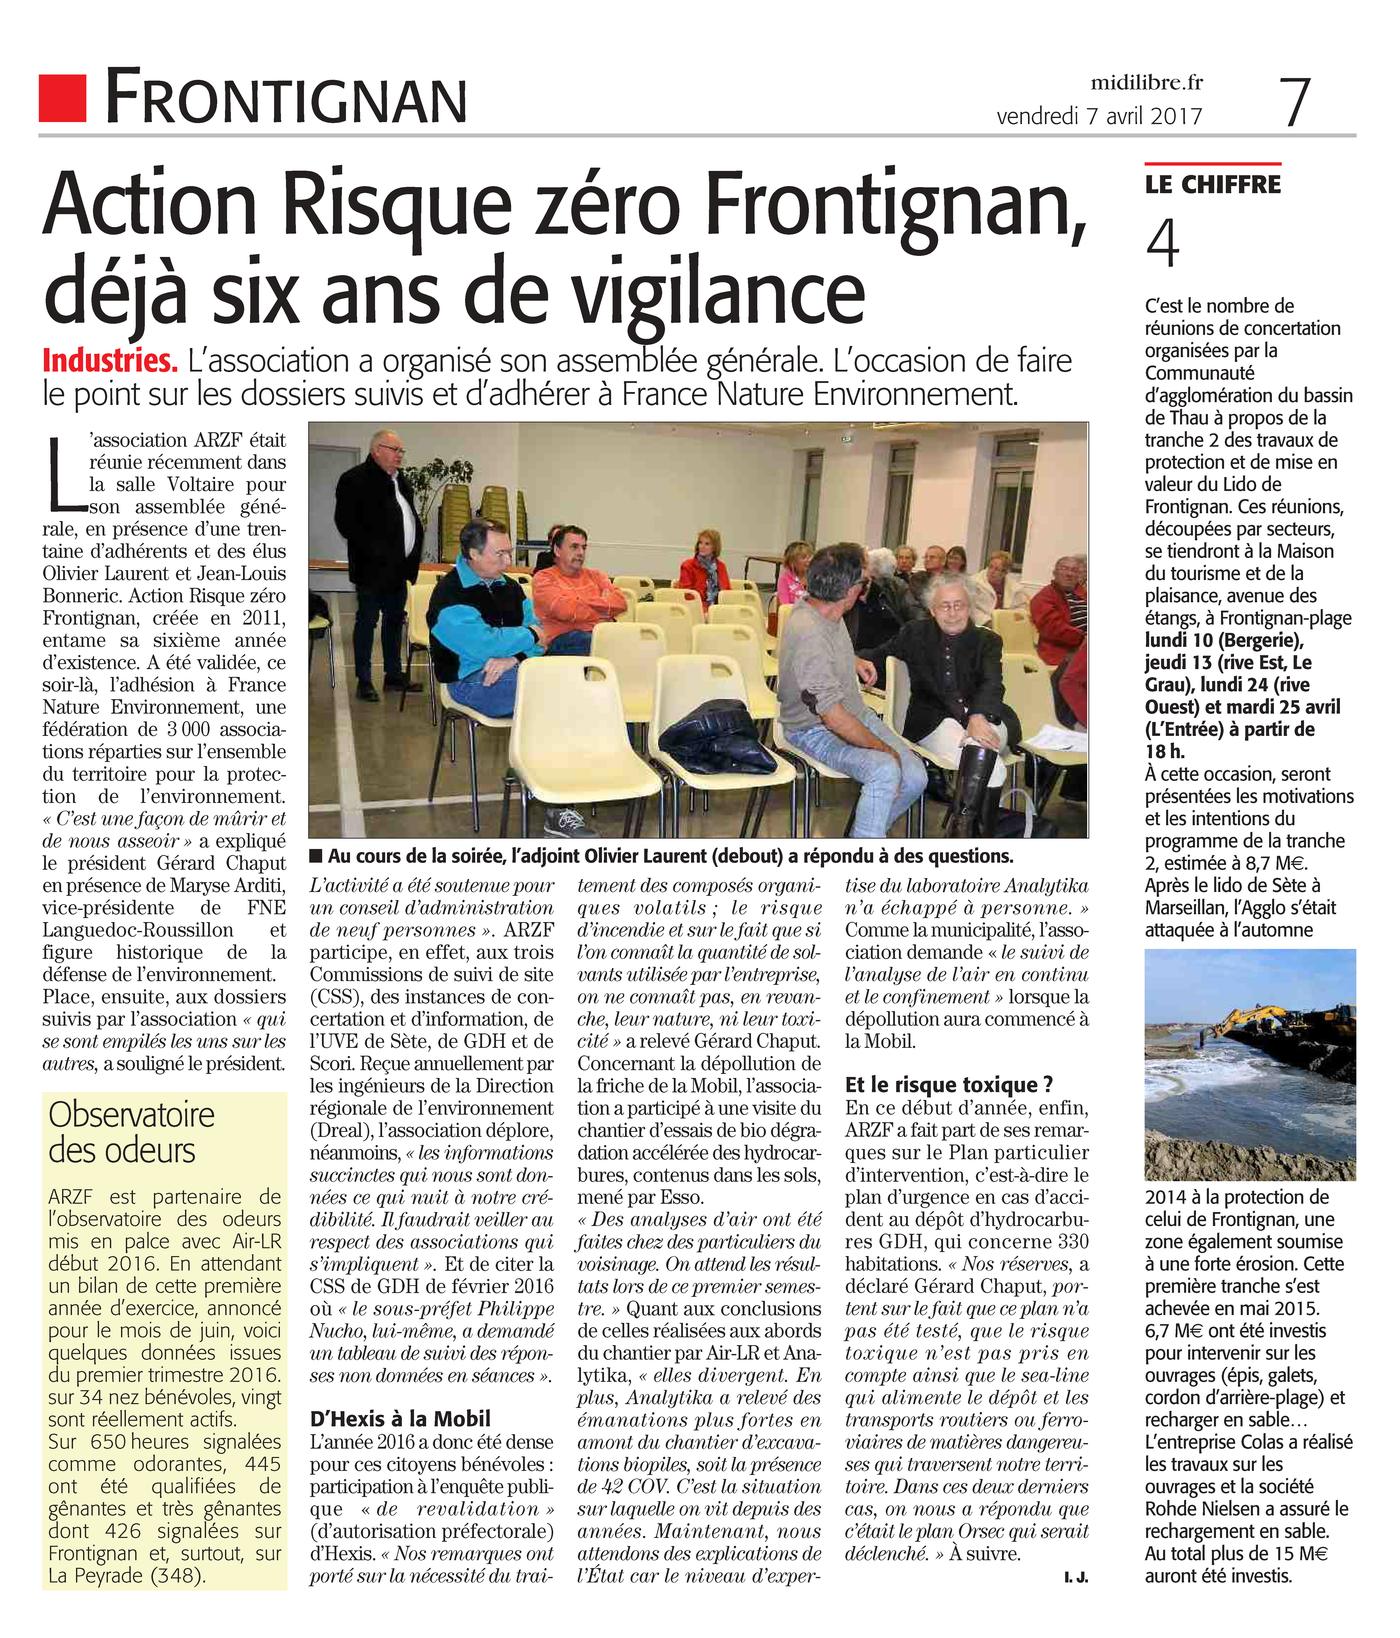 "07.04.2017 > MIDI-LIBRE :""Action Risque zéro Frontignan déjà six ans de vigilance"""